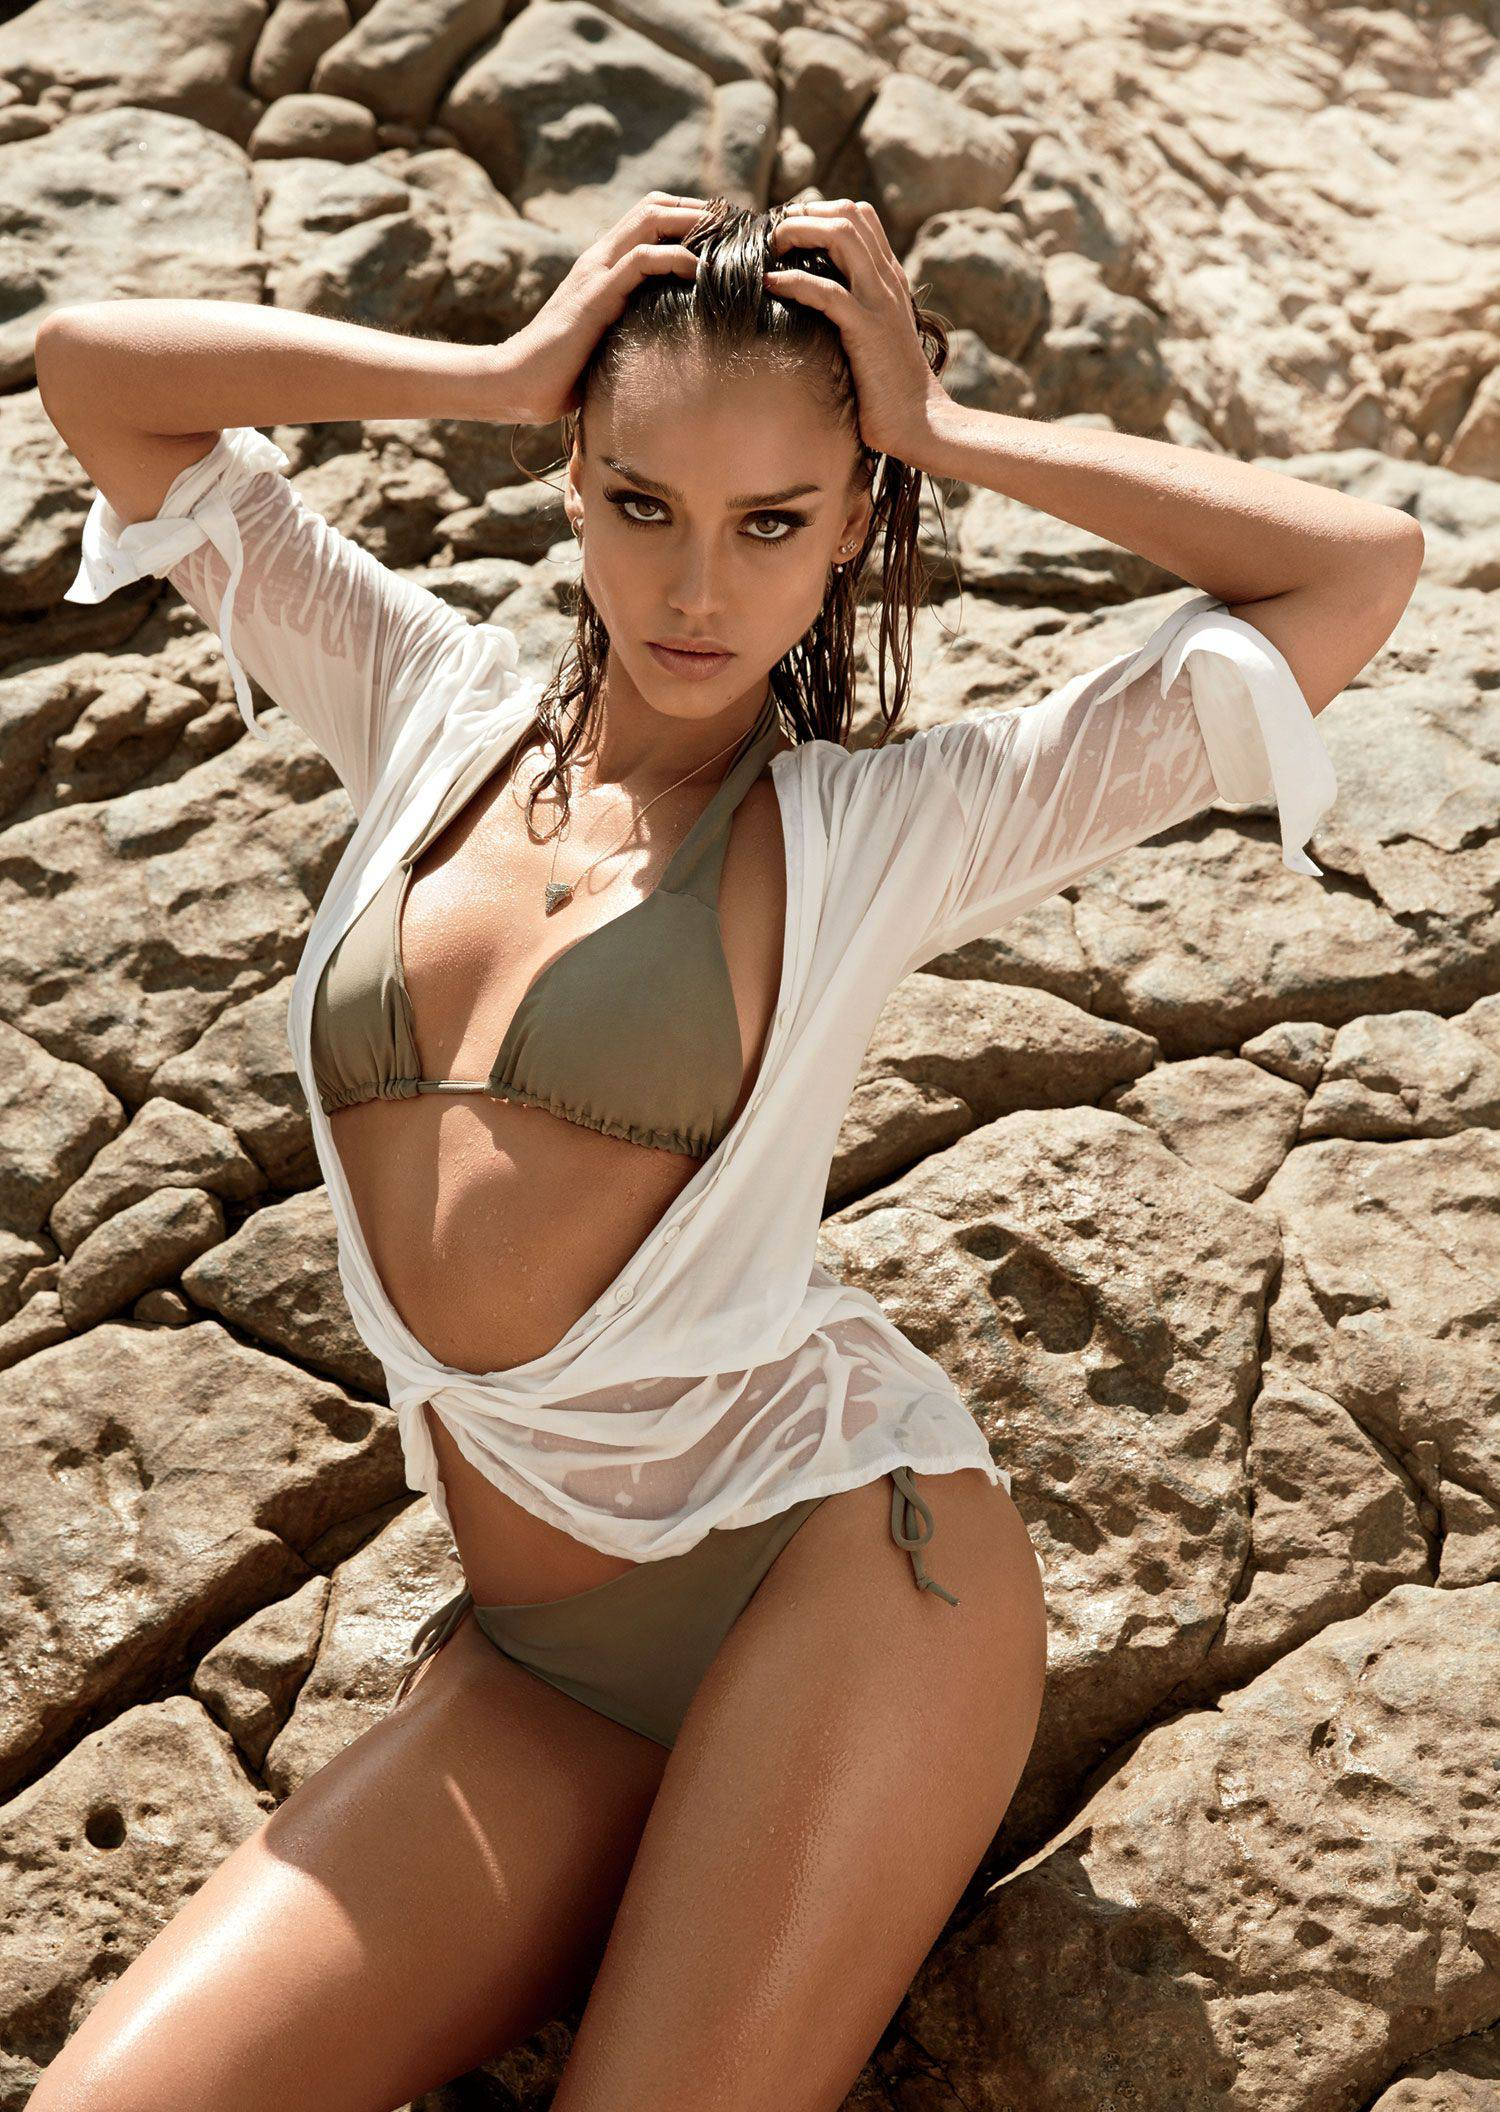 Jessica Alba – Beautiful Body In Sexy Photoshoot For Maxim Magazine (september 2014) (hq) 0002